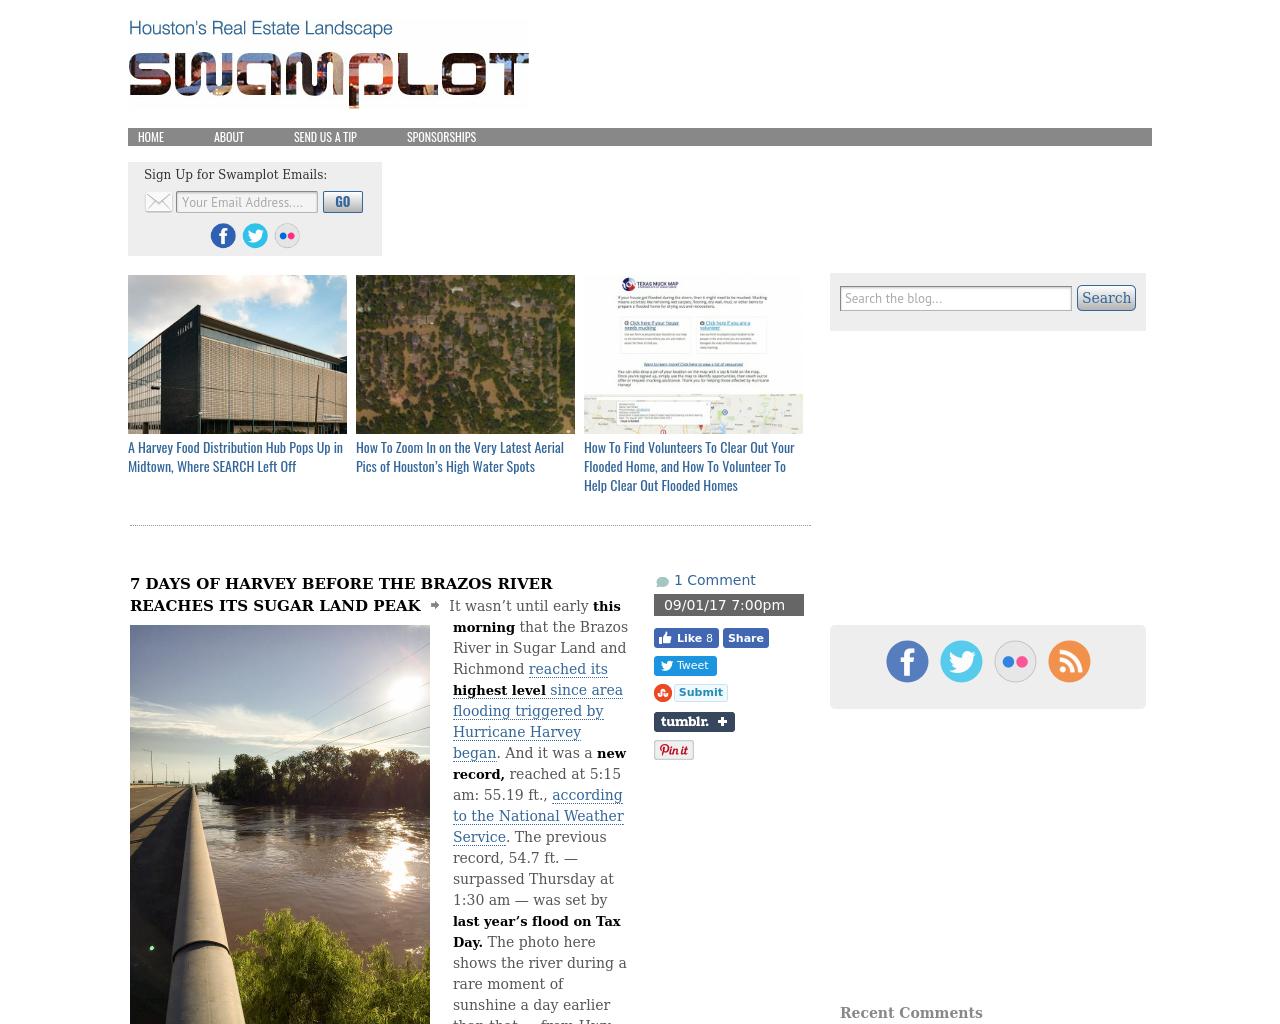 Swamplot-Advertising-Reviews-Pricing